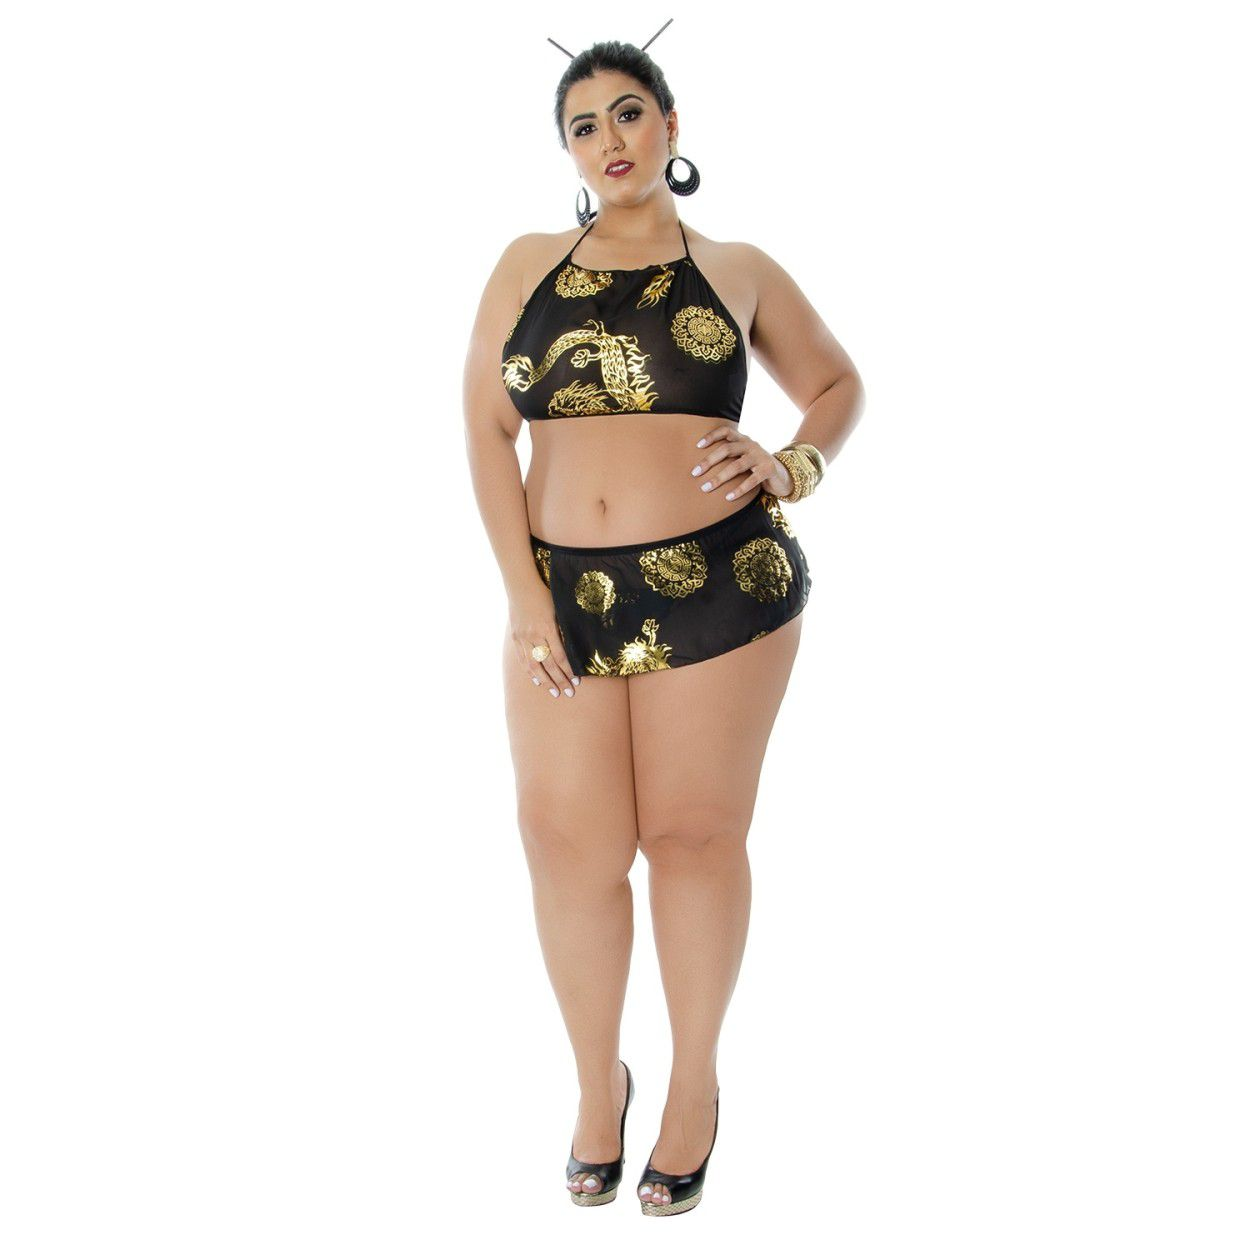 Fantasia Gueixa Karyn Plus Size (Veste Manequins 44 ao 50)